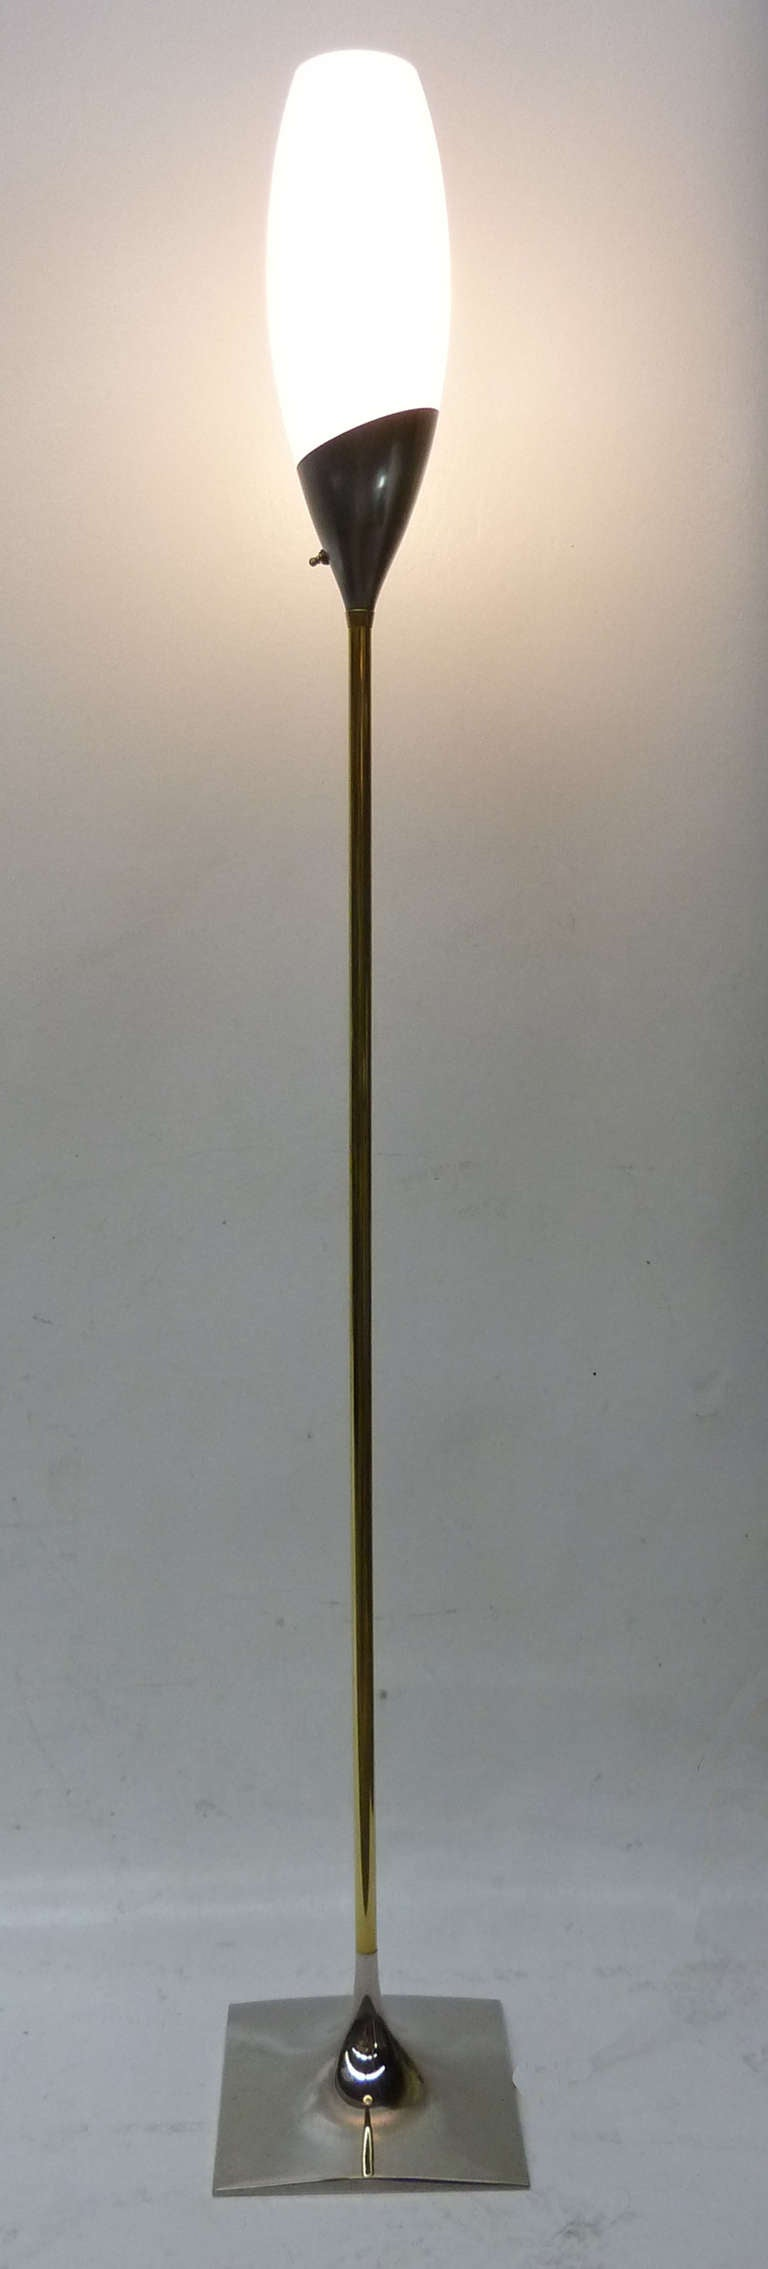 MId-Century Modern Floor Lamp by Gerald Thurston for ...